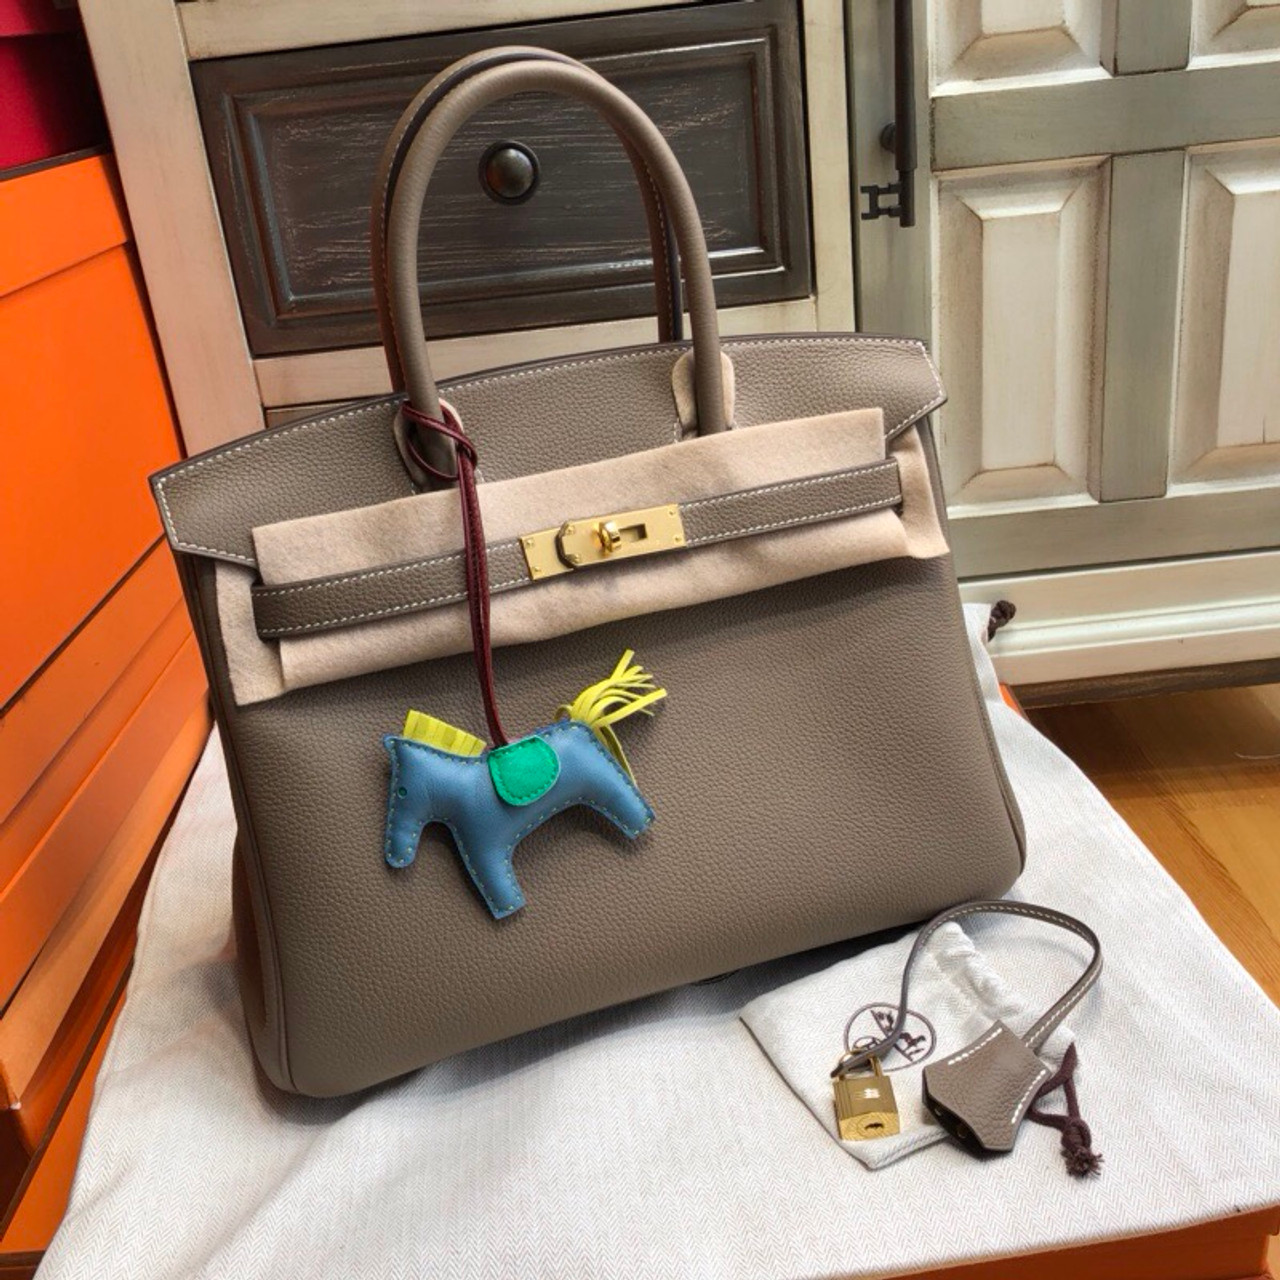 09c04d5ffc26 Hermès 18 Etoupe Birkin 30 cm Togo Leather Gold Hardware - Bella ...